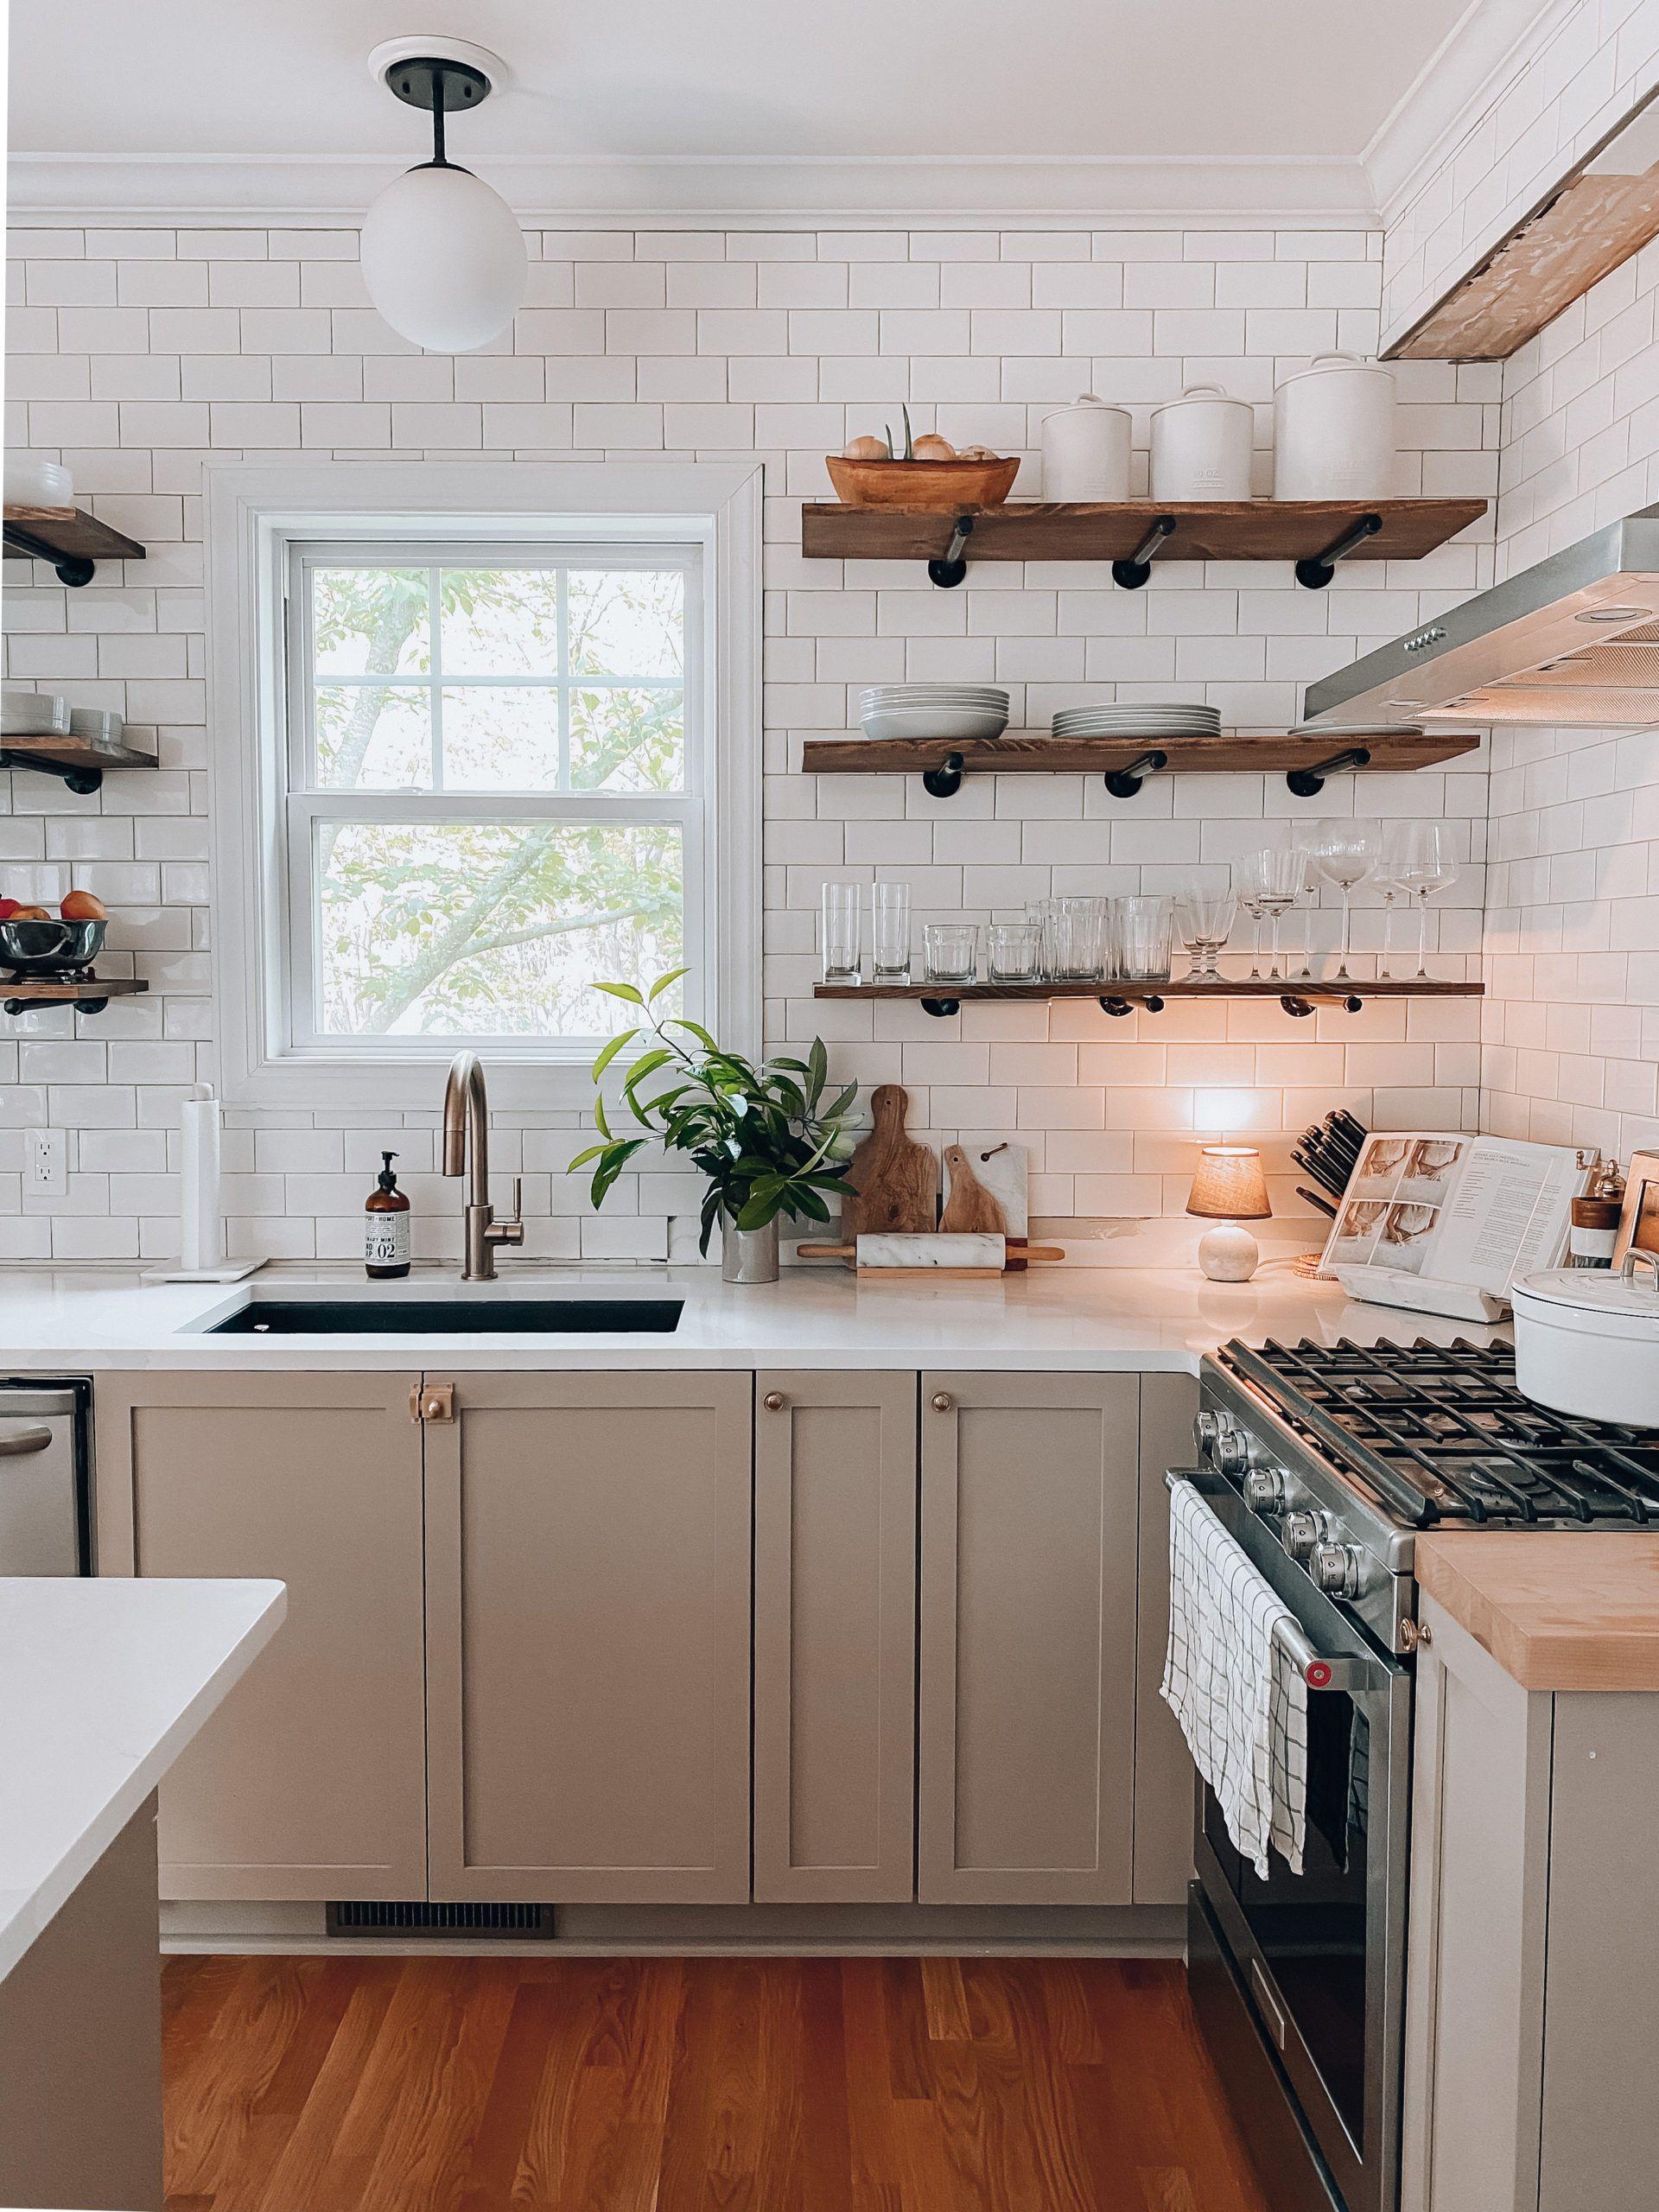 Ways to Keep Your Kitchen Organized